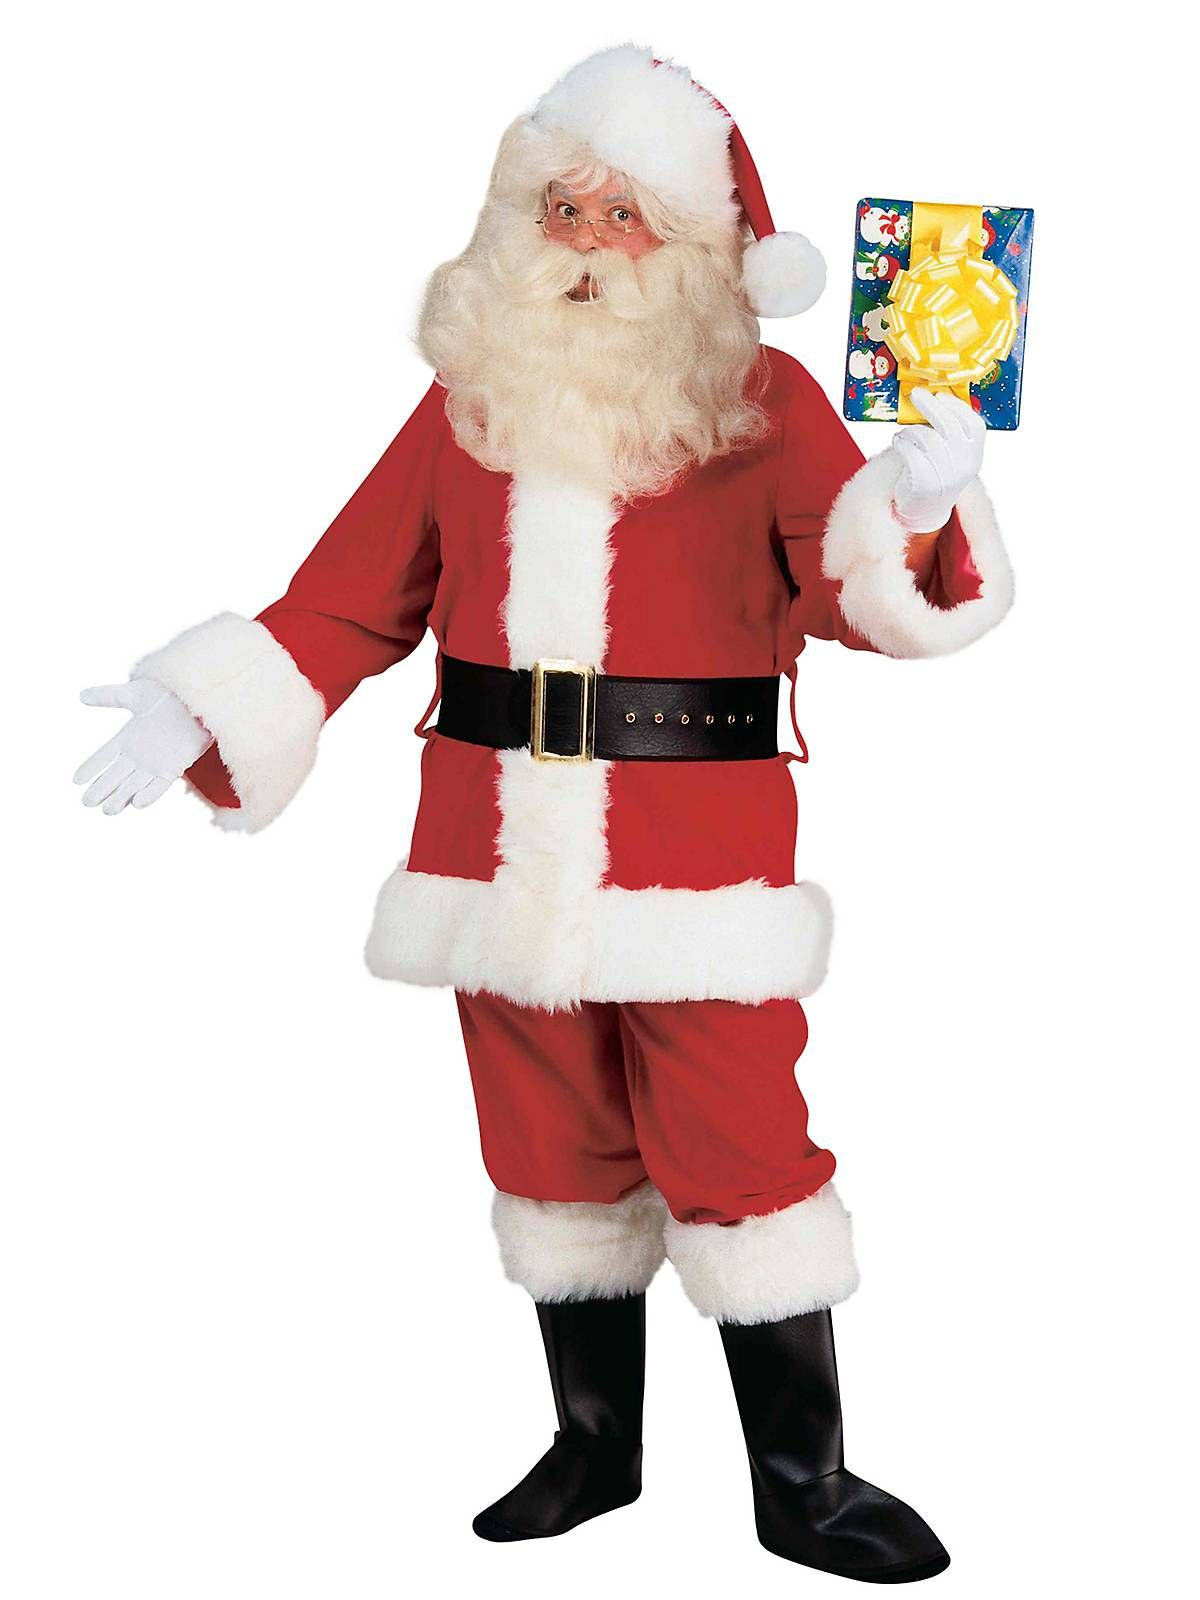 Pin On Christmas Fun Costume Ideas